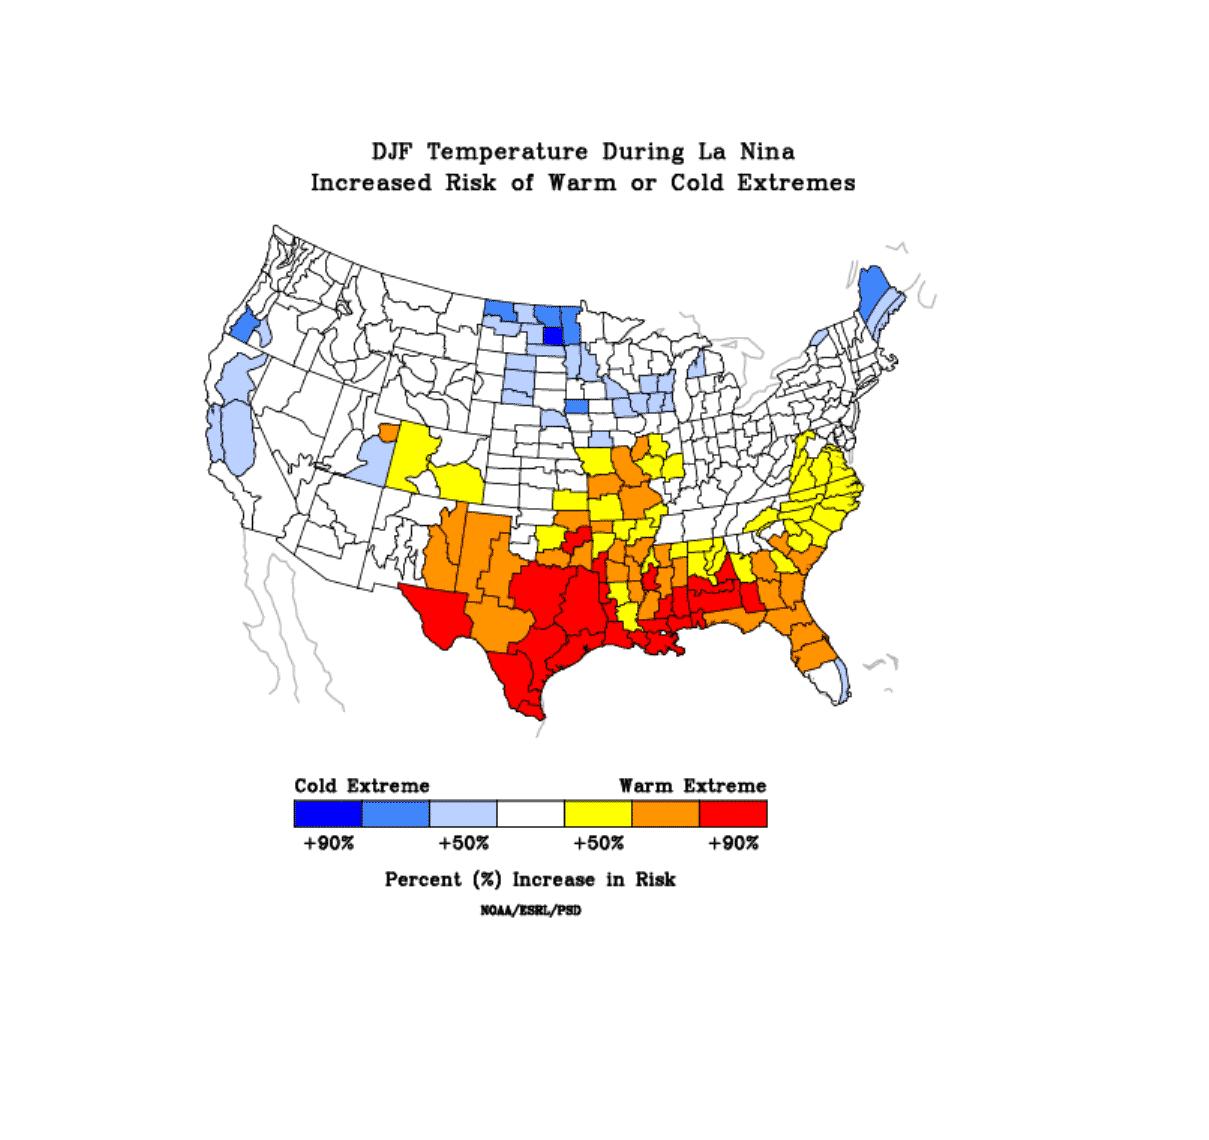 winter-forecast-season-enso-la-nina-temperature-impact-united-states